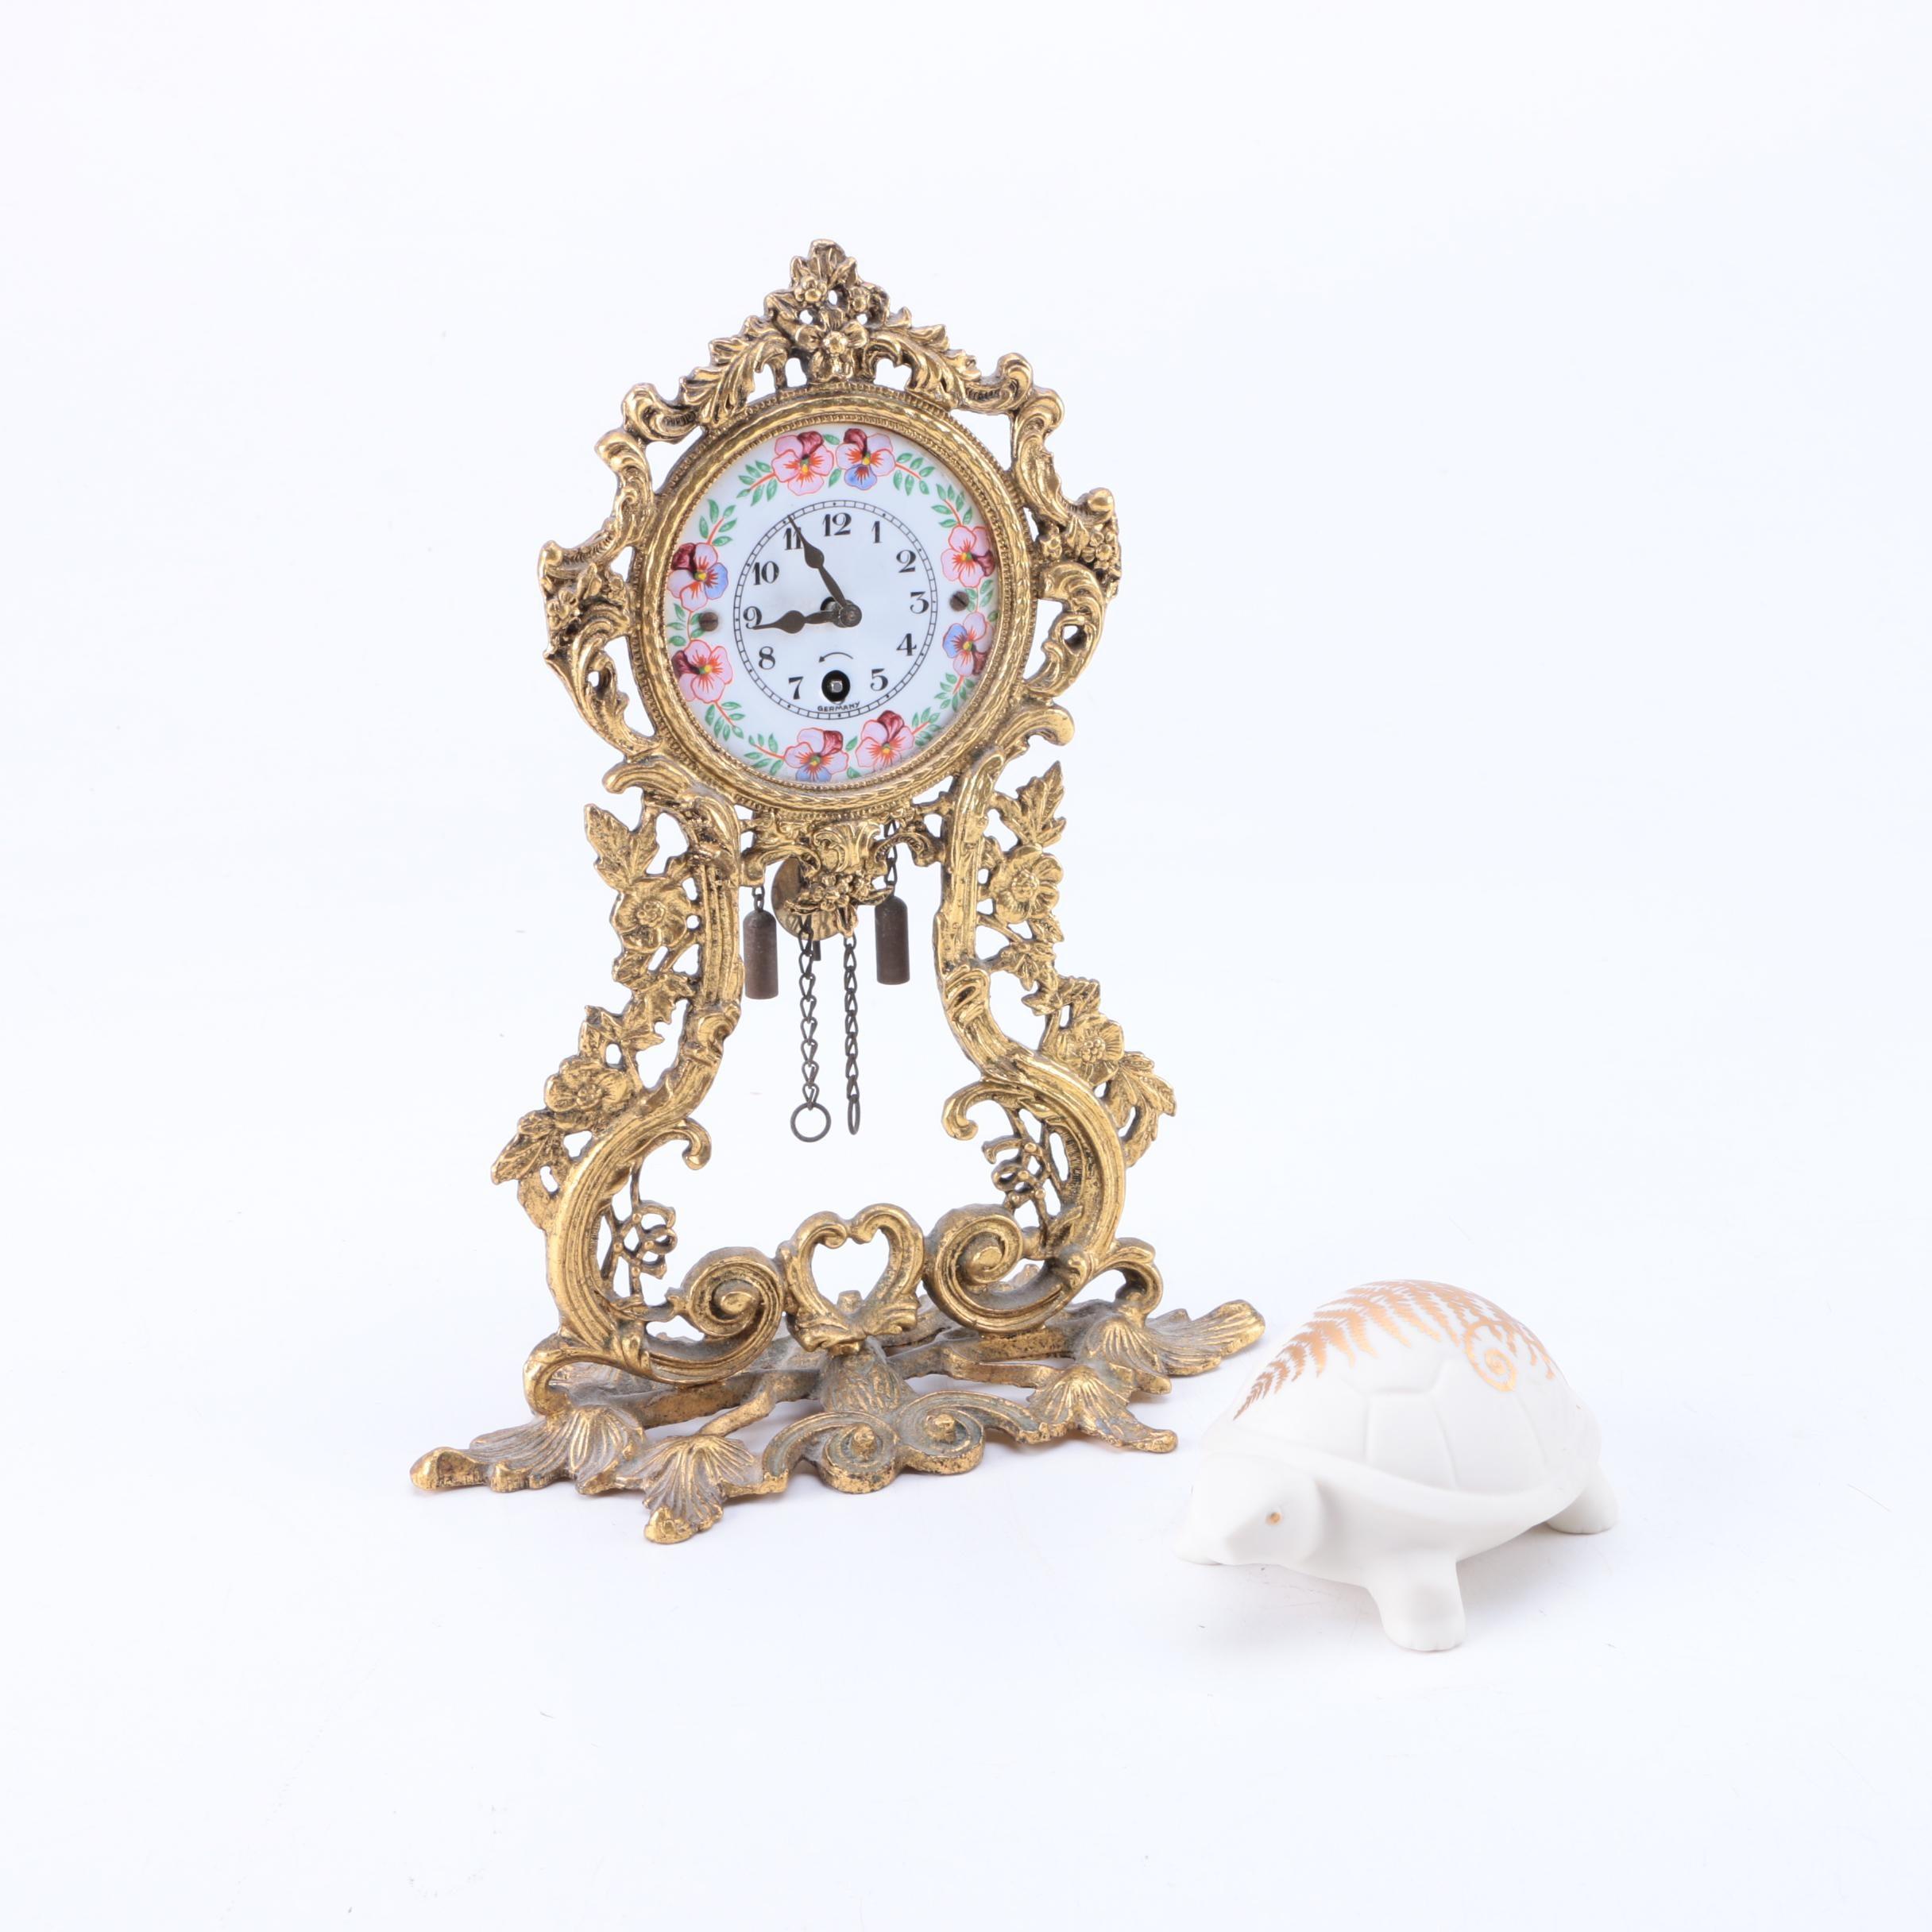 Decorative German Clock and Lenox Porcelain Turtle Figurine